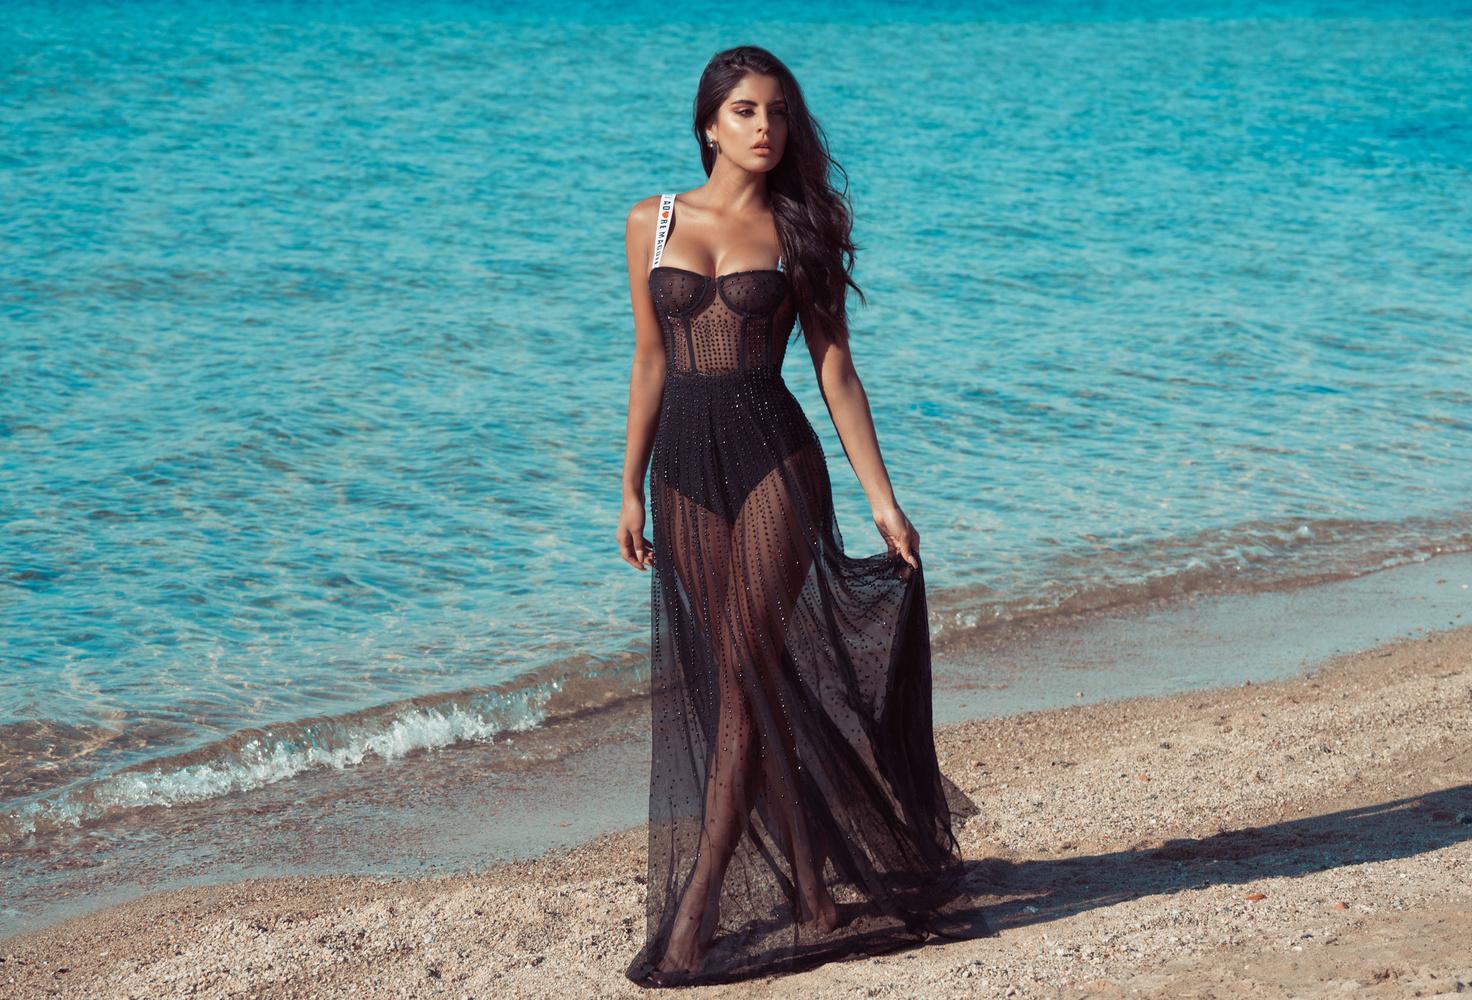 Saint Tropez Fashion Campaign | Diana Tupilus by Diana Tupilus